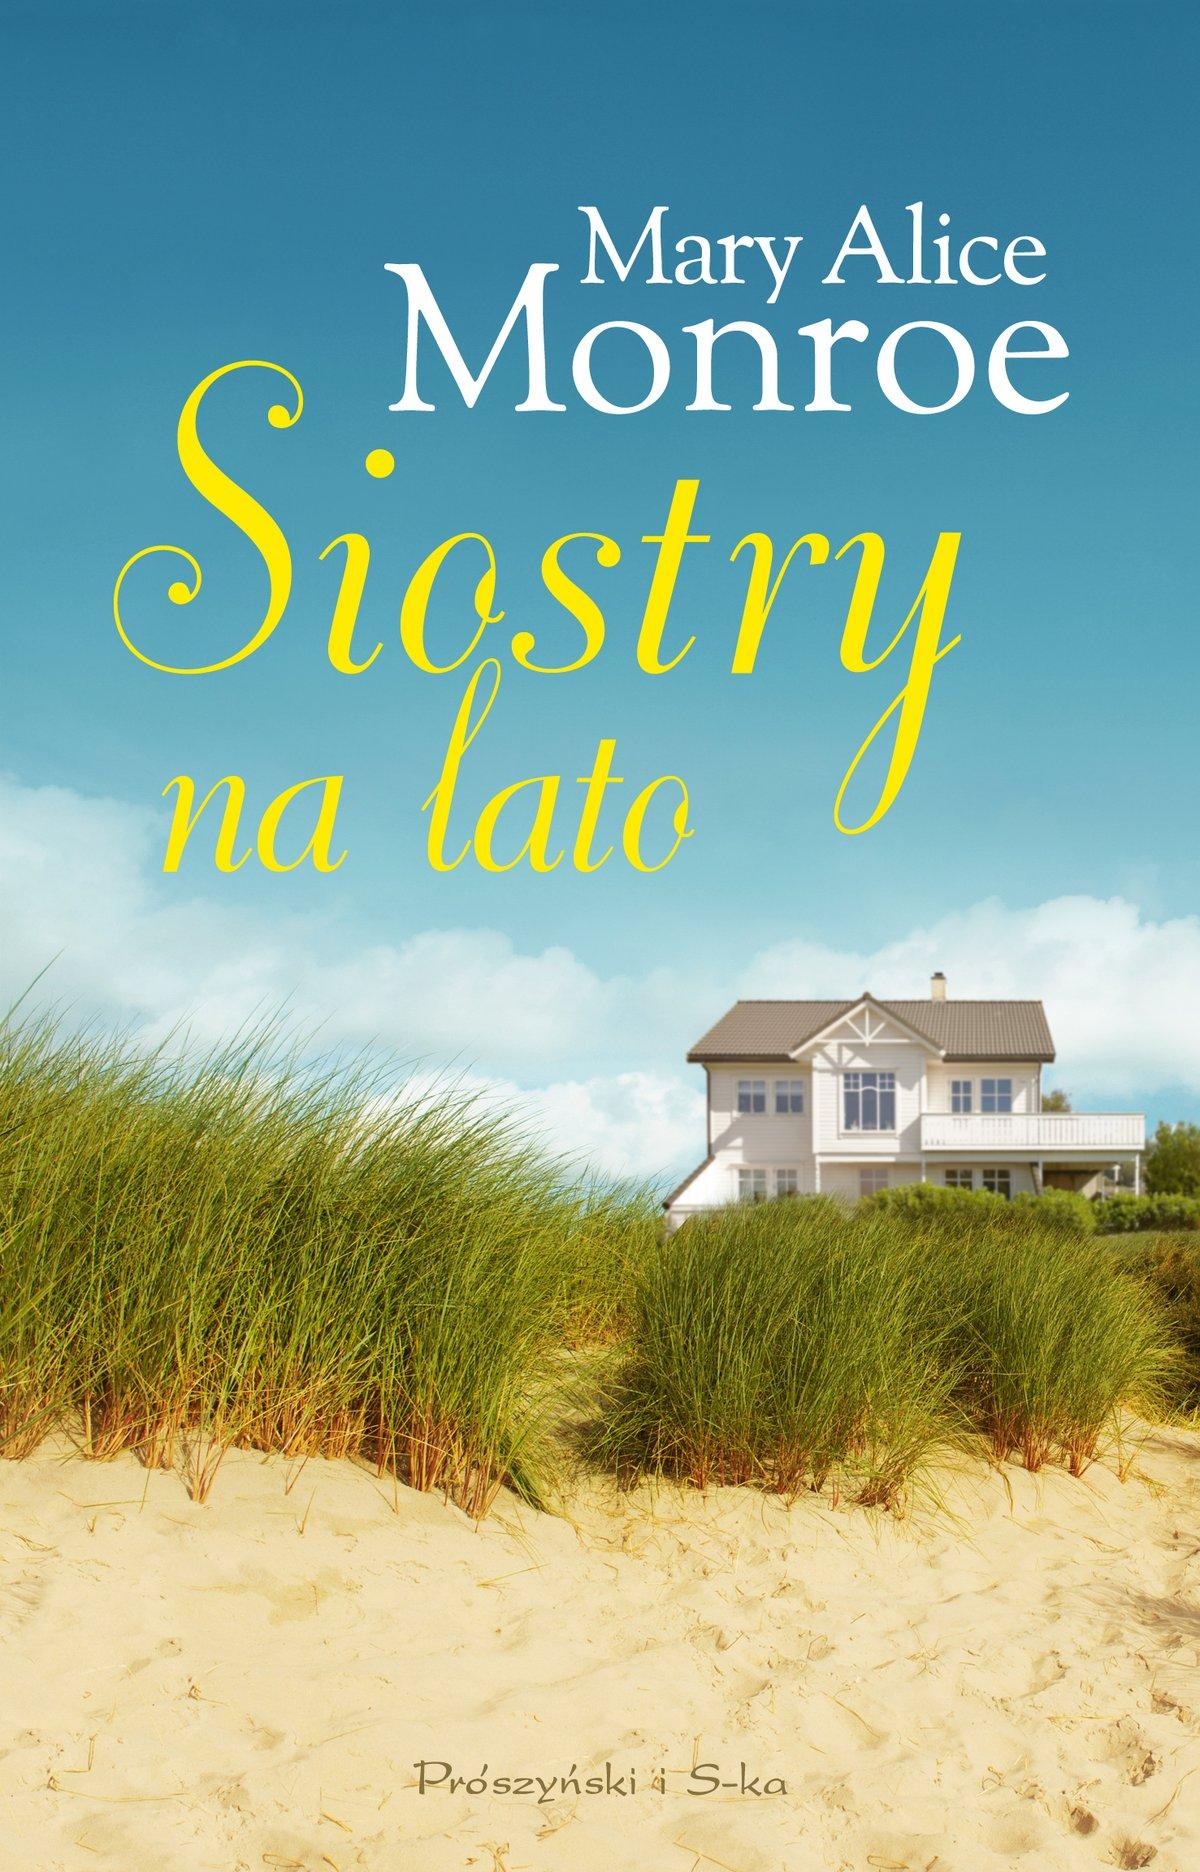 Siostry na lato - Ebook (Książka na Kindle) do pobrania w formacie MOBI